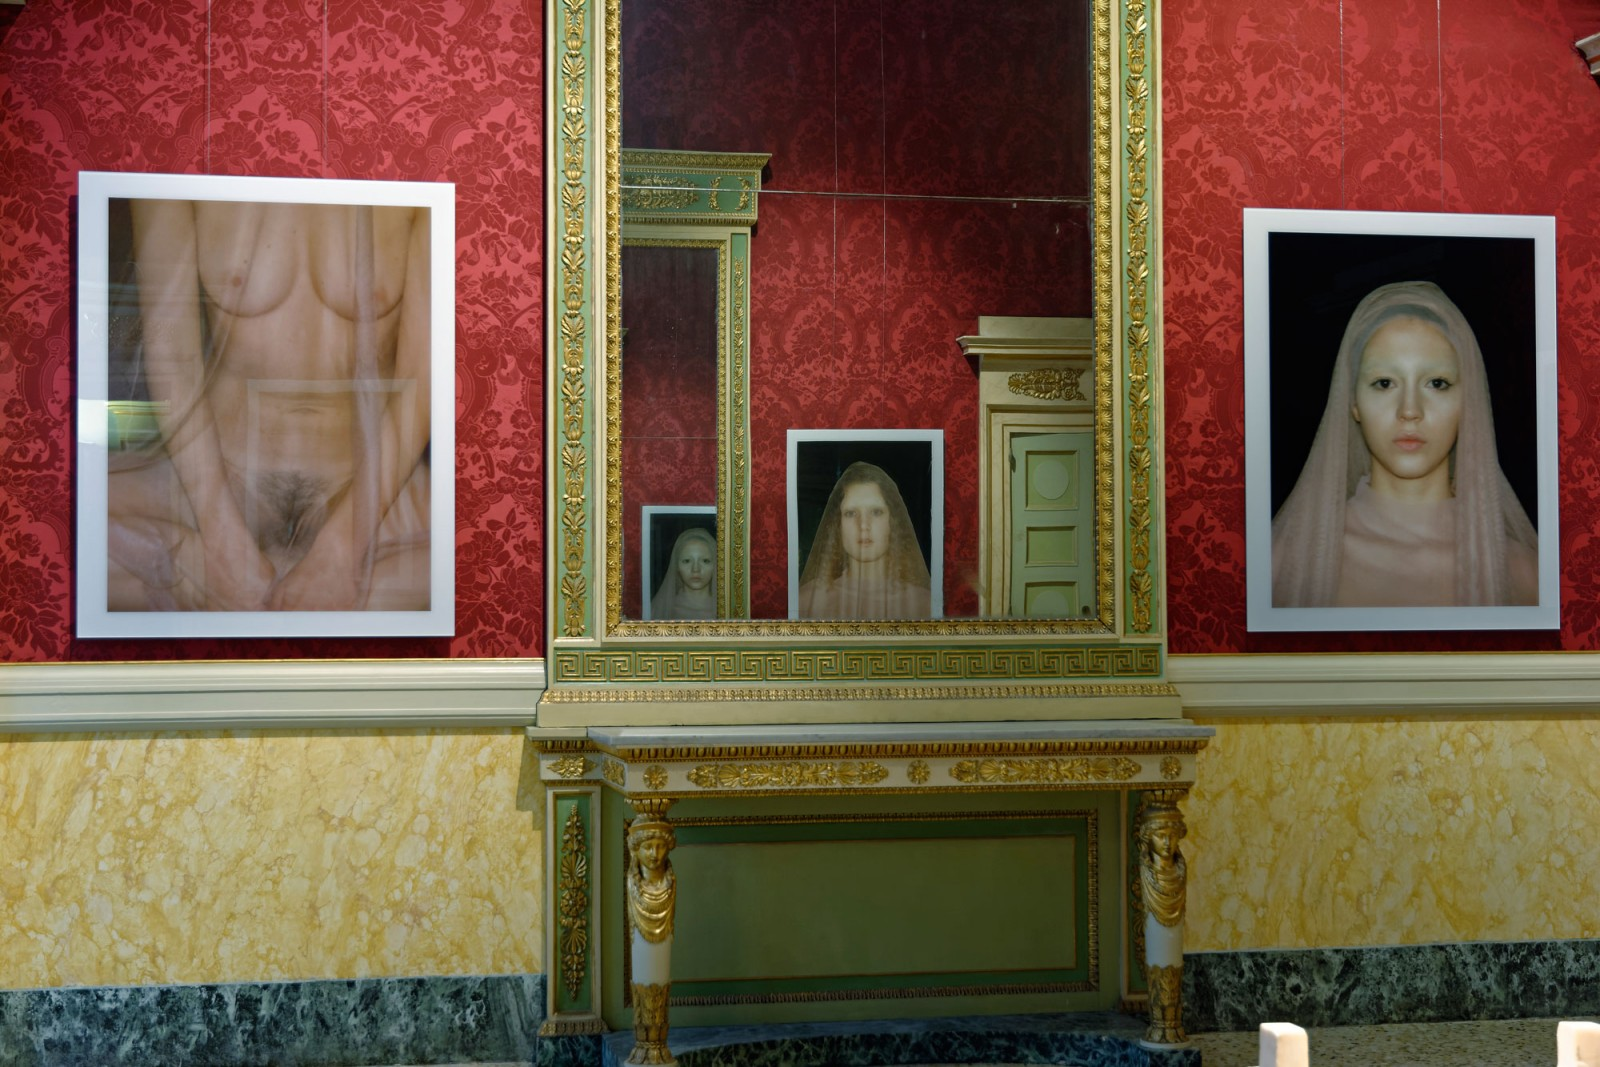 Vanessa Beecroft, Polaroids, 1993.2016